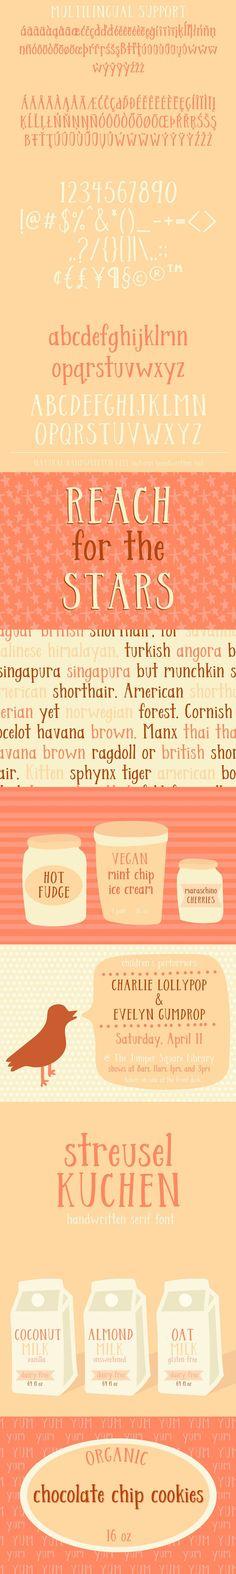 Streusel Kuchen Handwritten Serif - Web & Graphic Design on SVG Ninja Best Serif Fonts, Vegan Fudge, Coconut Chocolate Chip Cookies, Organic Chocolate, Punctuation, Lowercase A, This Or That Questions, Ninja, Graphic Design